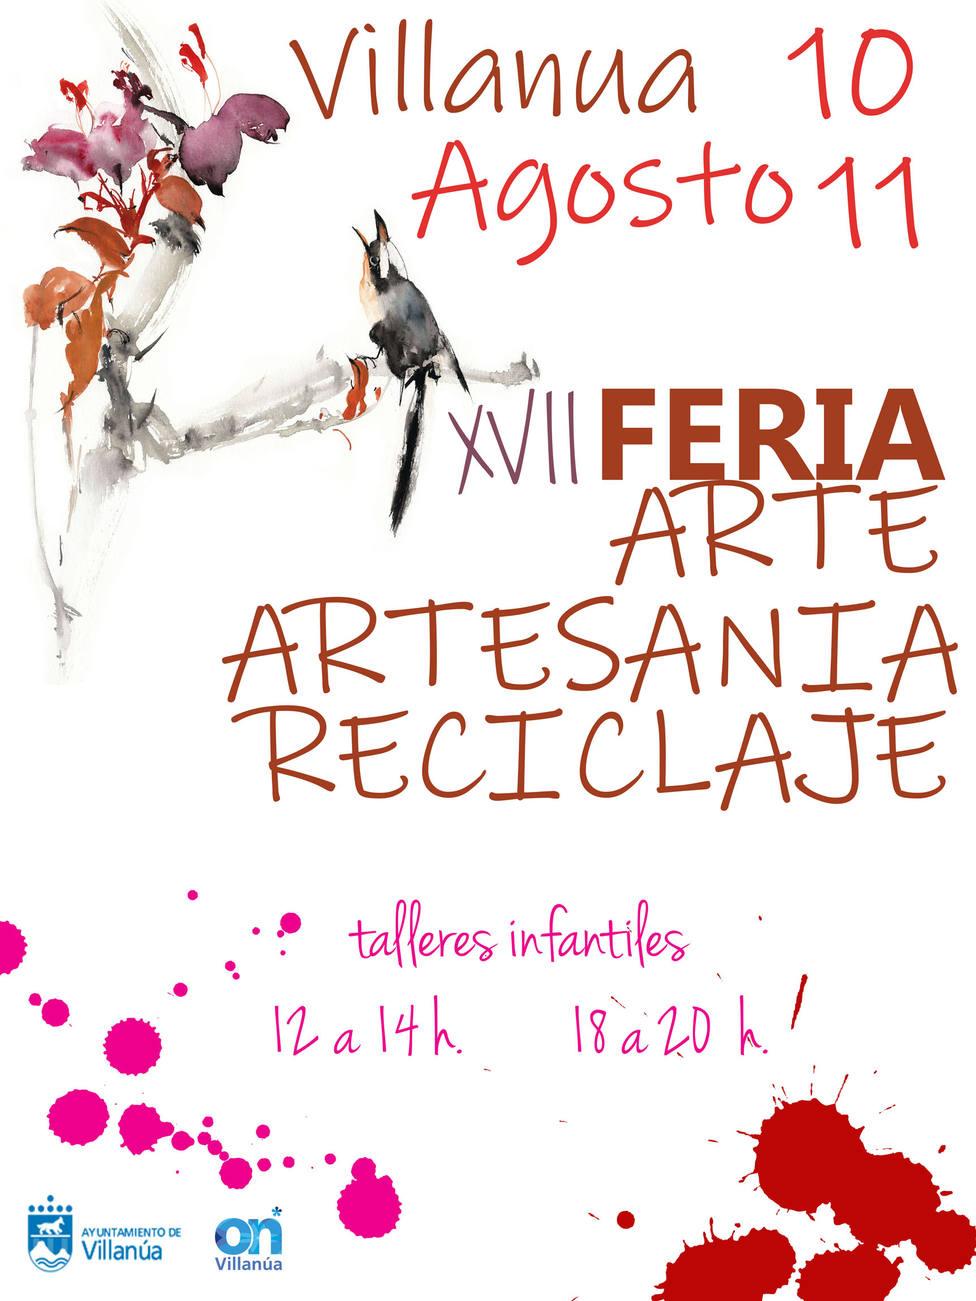 Feria de artesanía de Villanúa